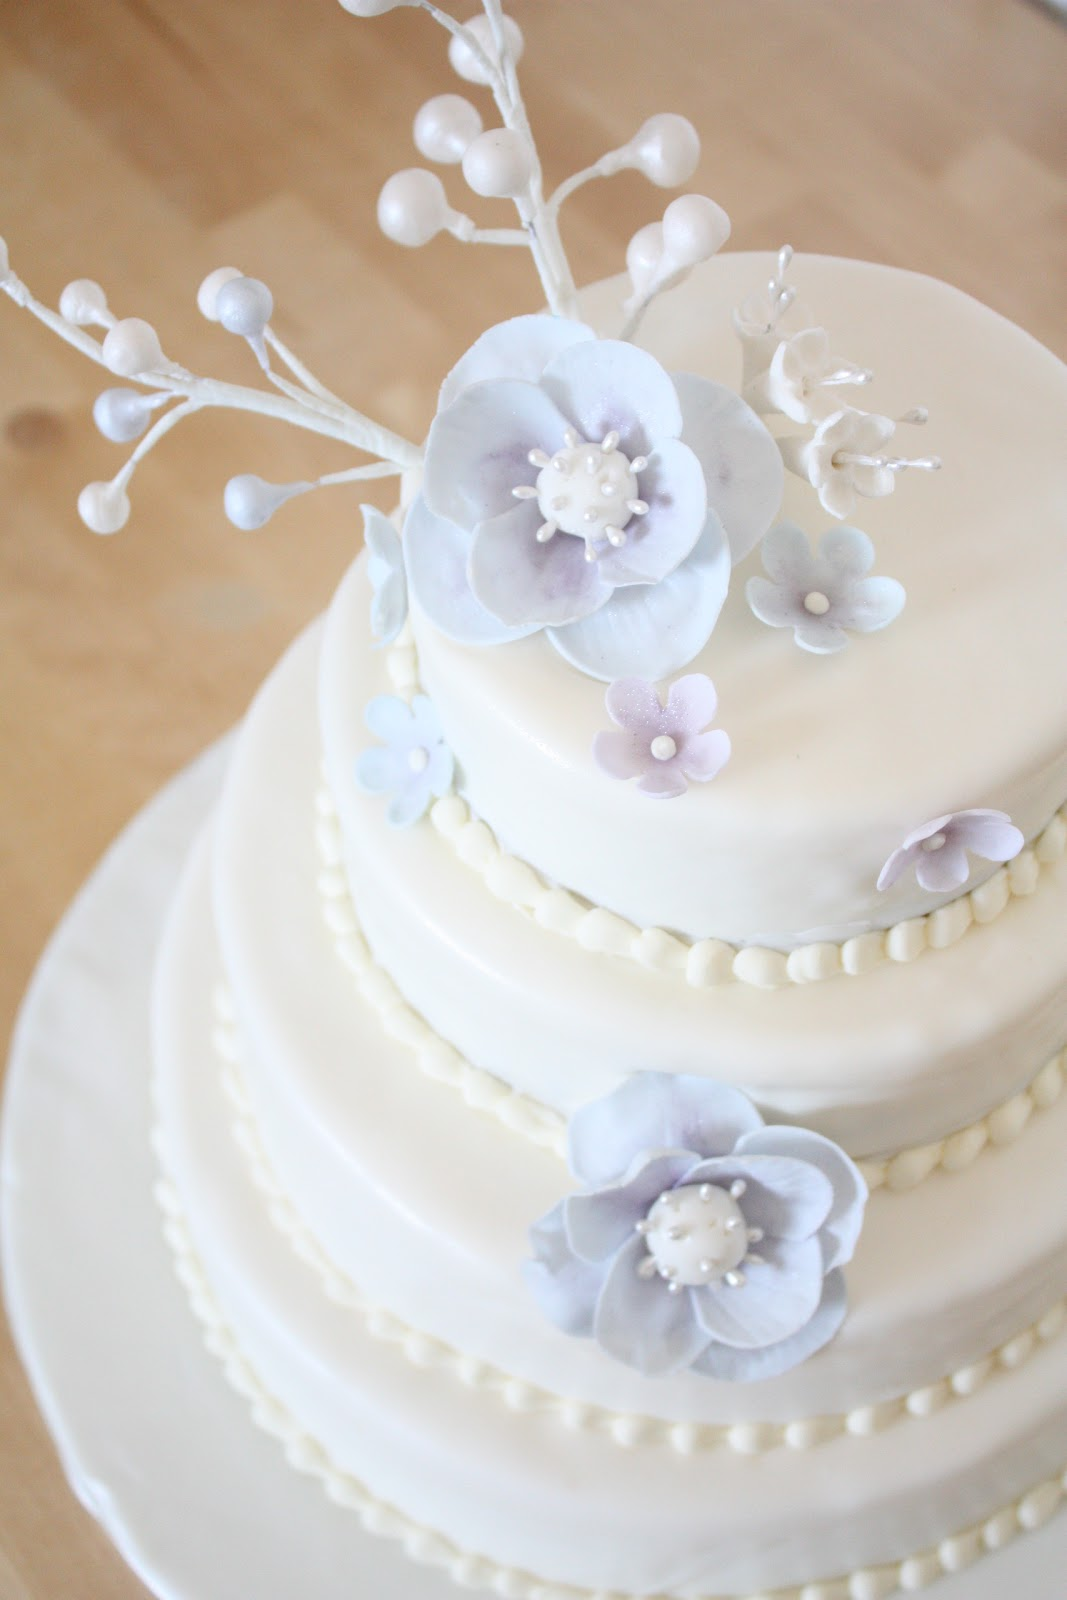 Bites Of Sweetness Custom Cakes And Goodies Wedding